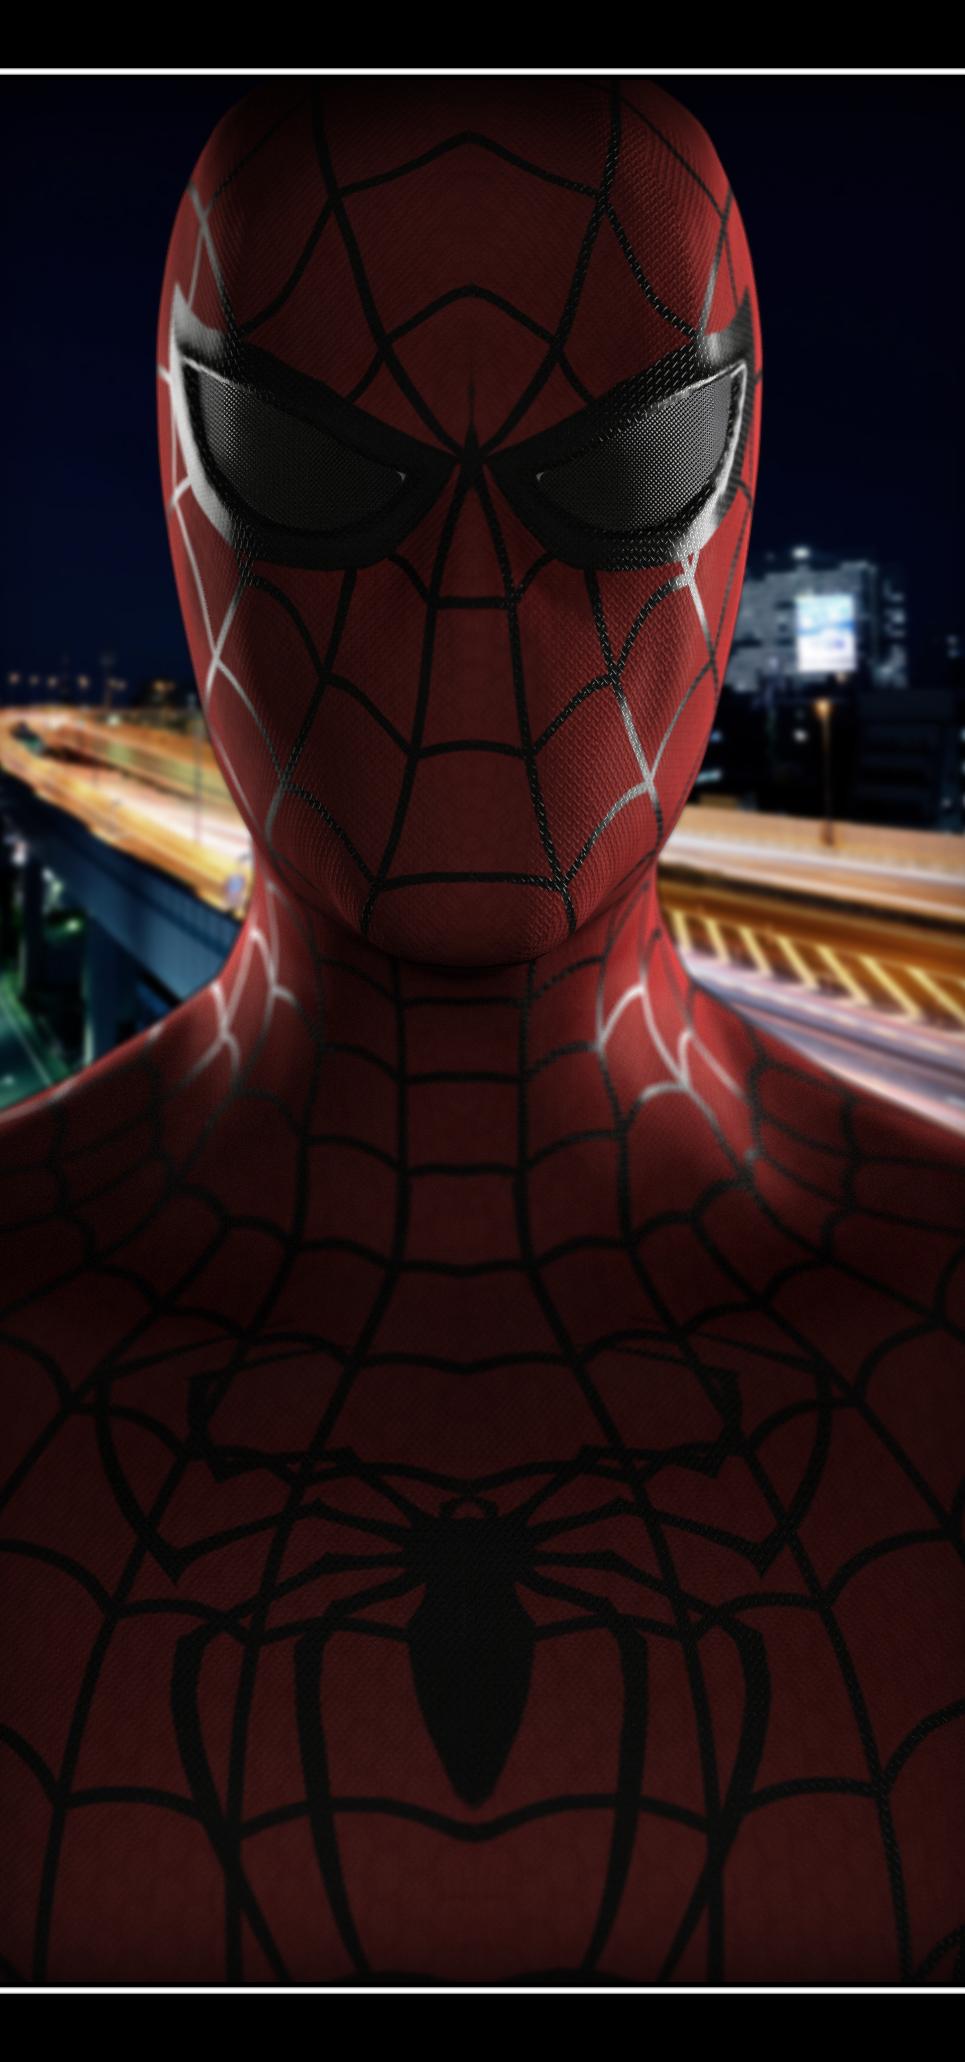 Spiderman show